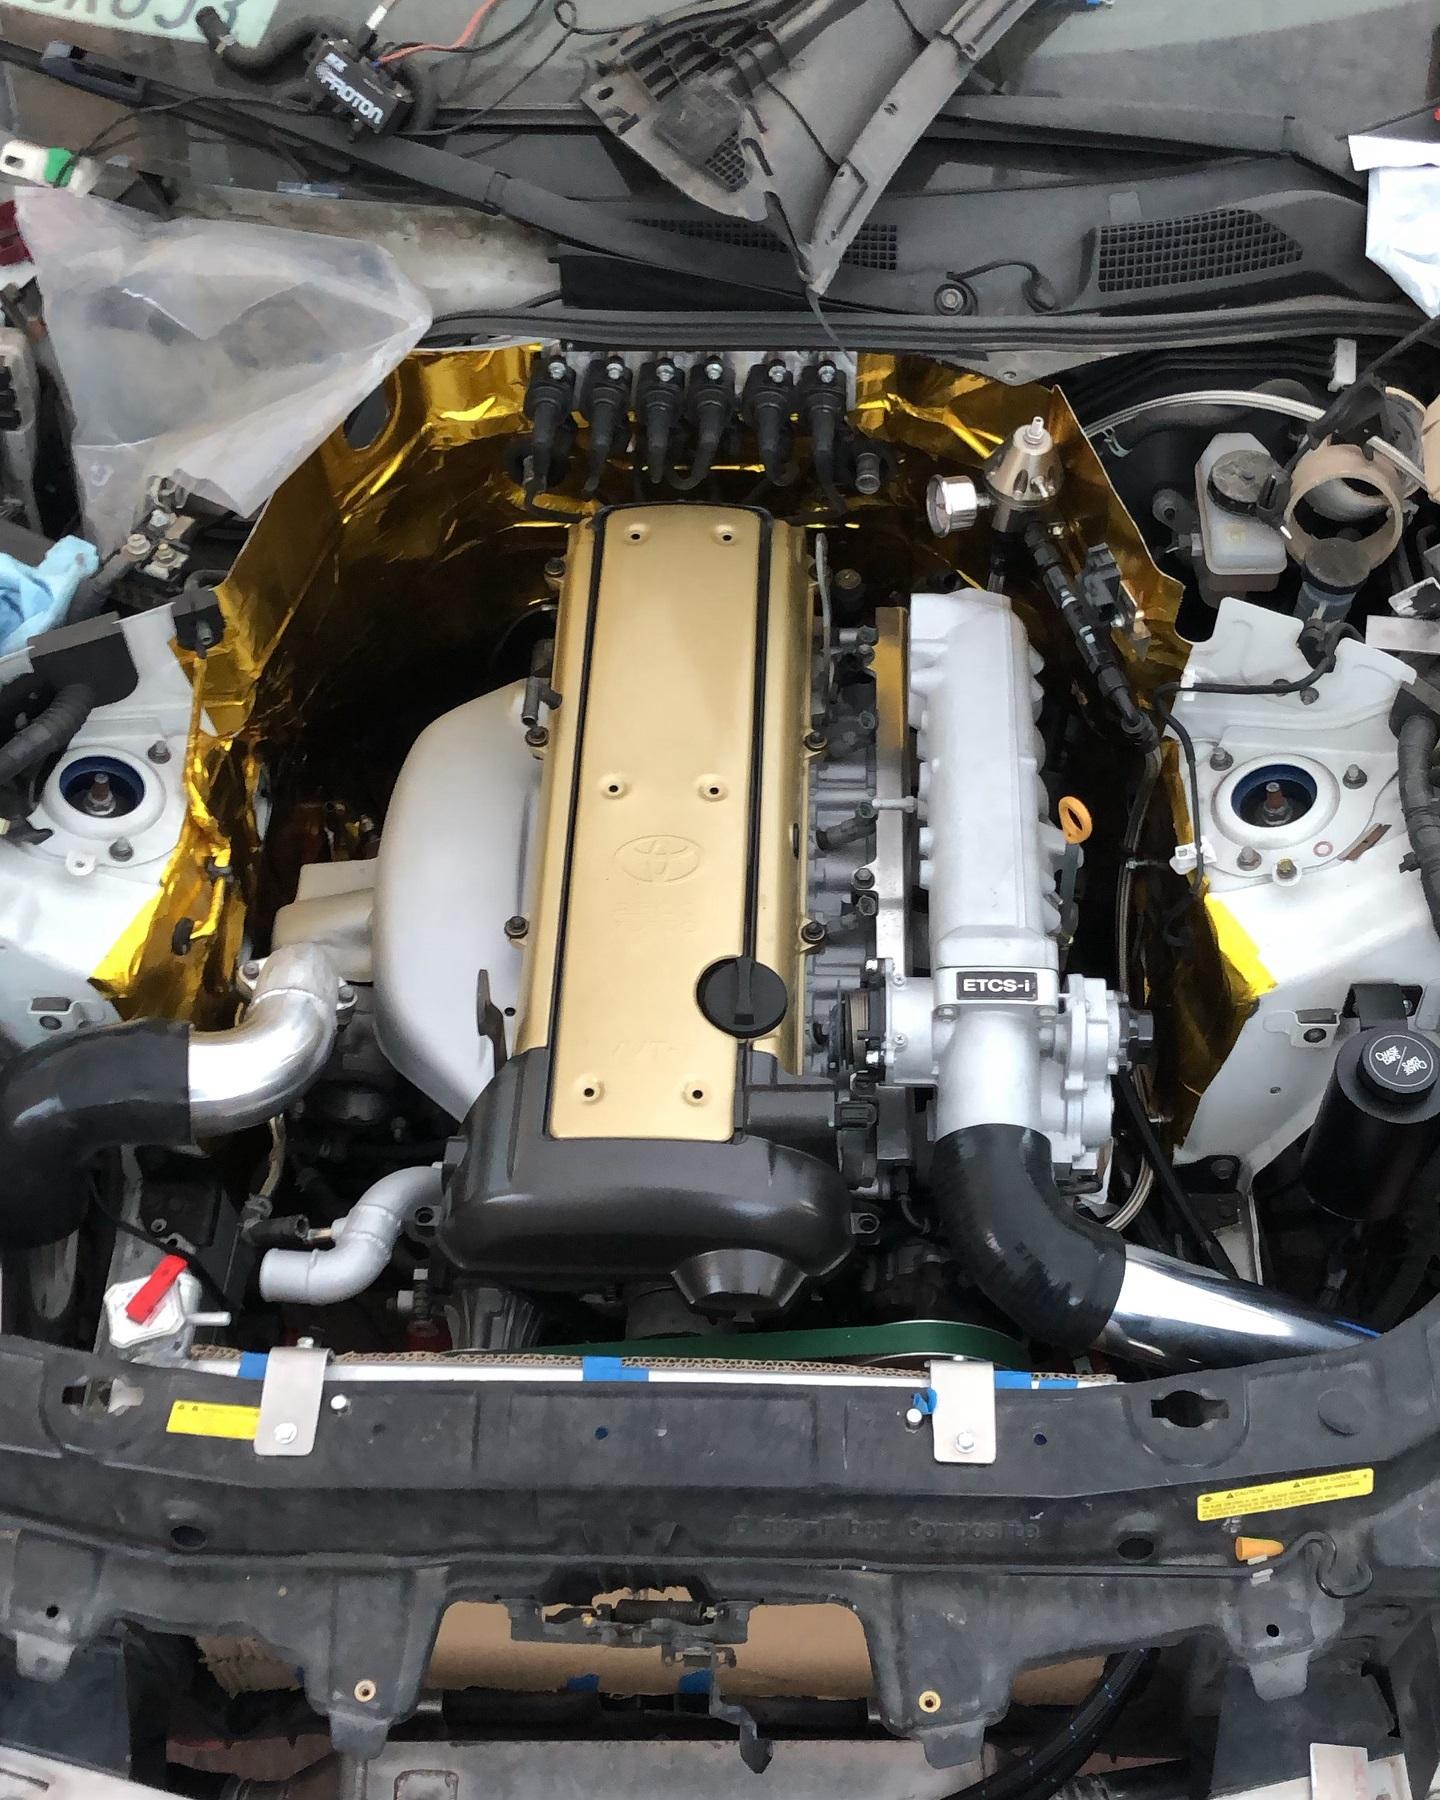 Chase Bays Power Steering Kit - Nissan 350Z / Infiniti G35